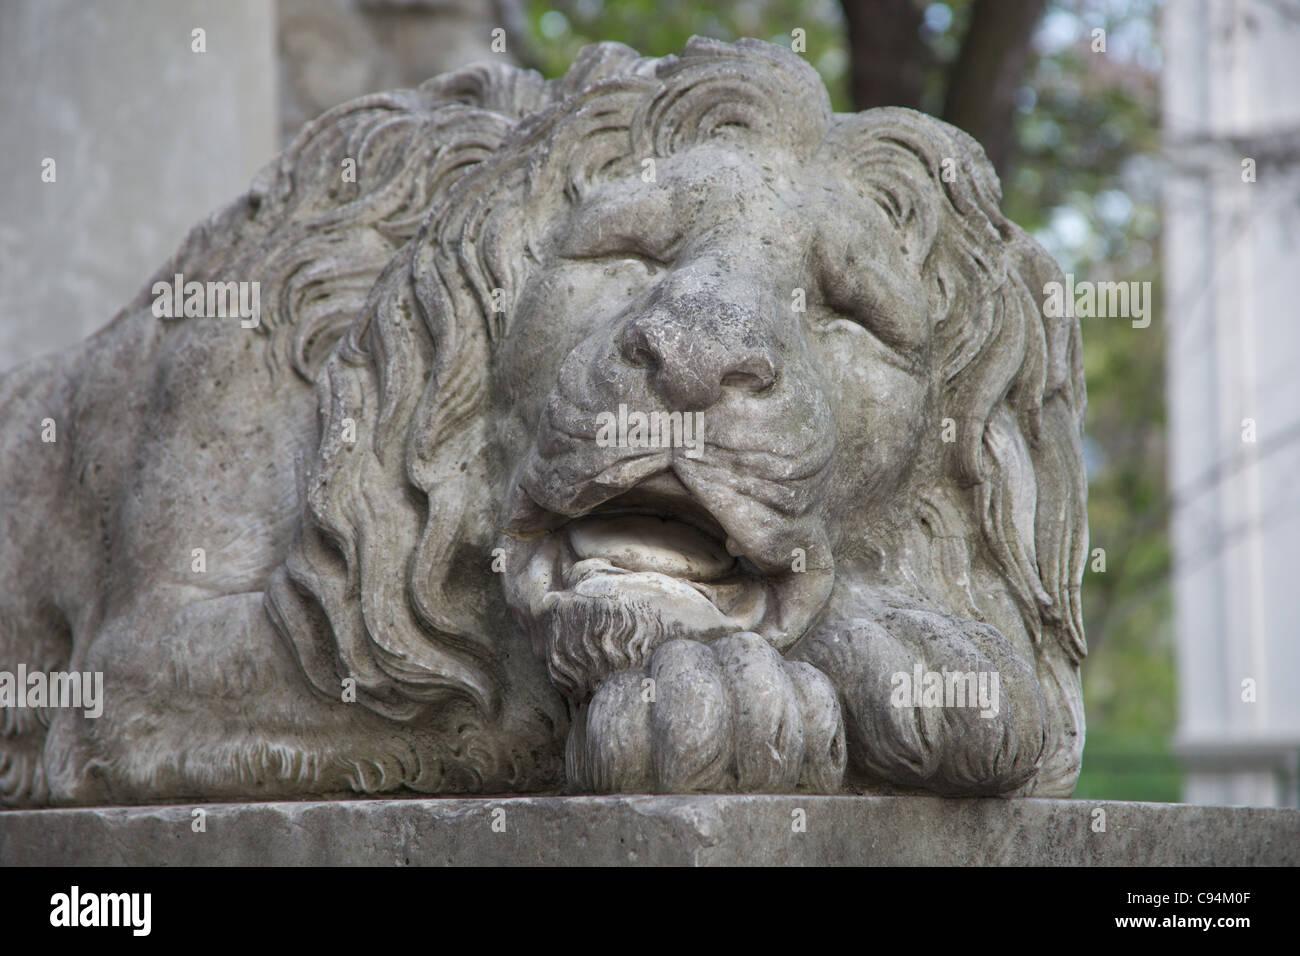 Statue of Sleeping Lion, L'viv, Ukraine - Stock Image